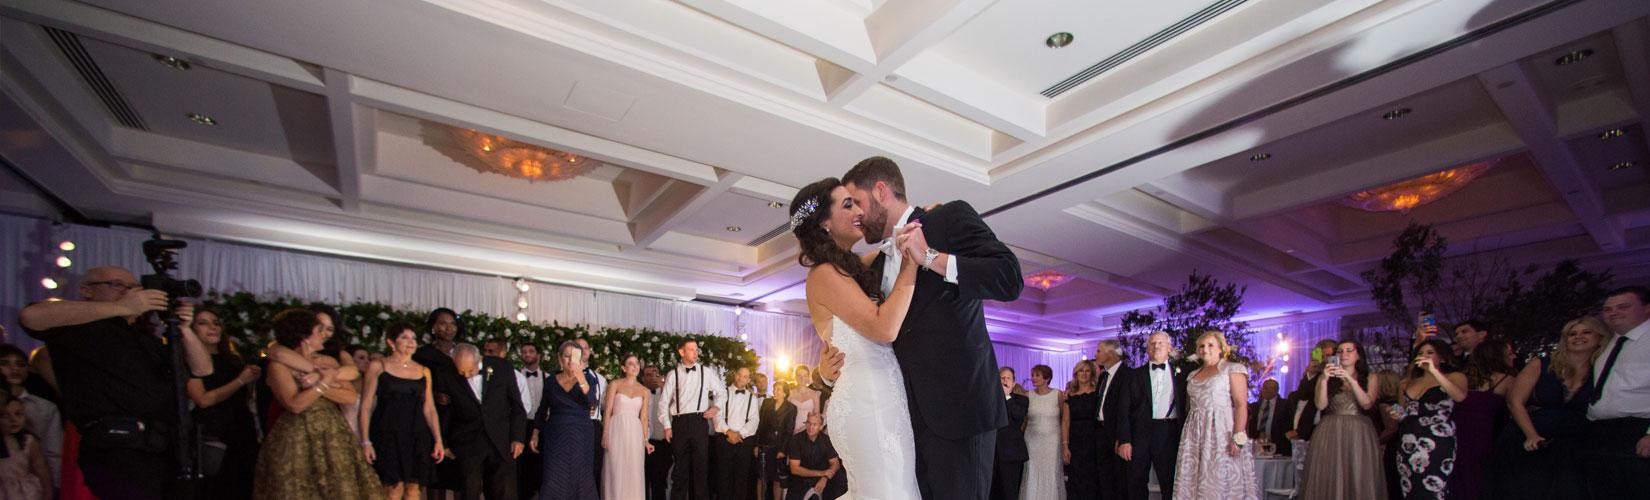 Four Seasons Palm Beach Weddings | Sara Kauss Photography